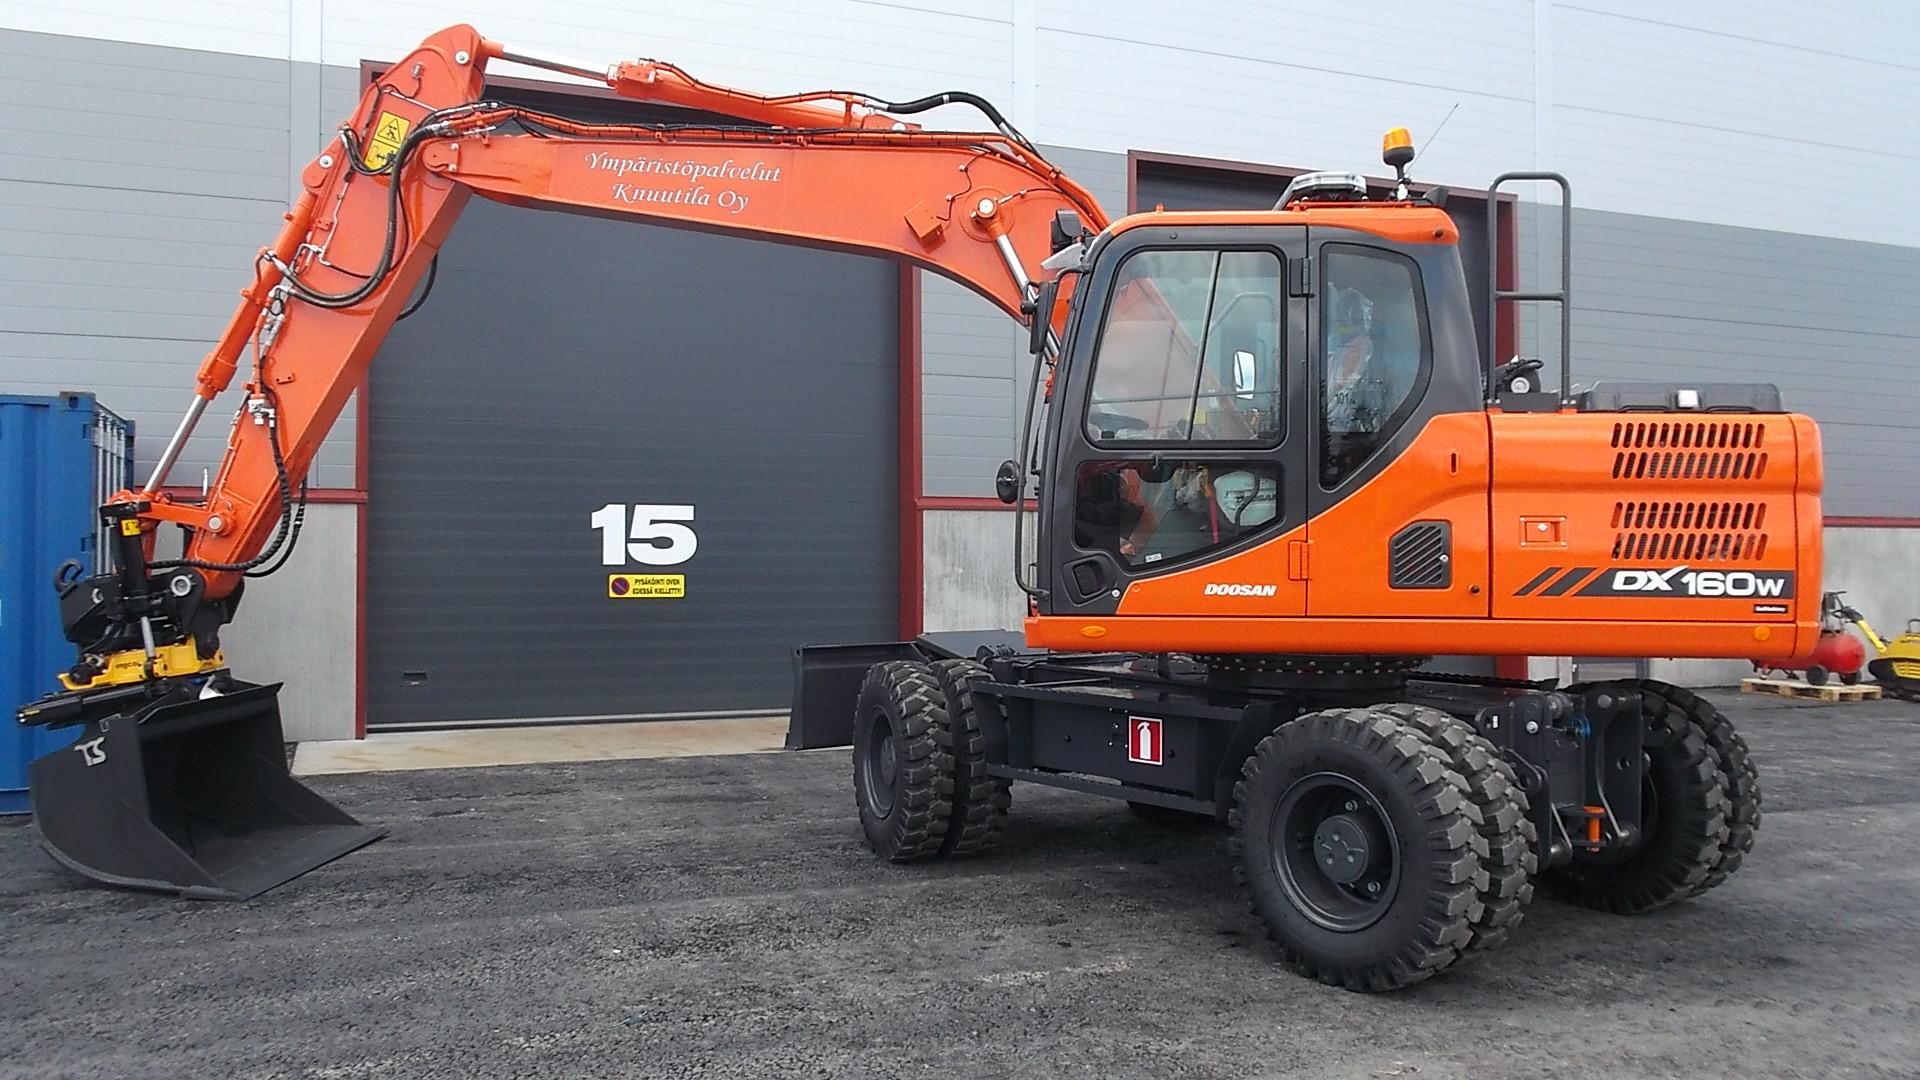 Ympäristöpalvelu Knuutila Oy:n uusi Doosan DX160W-3